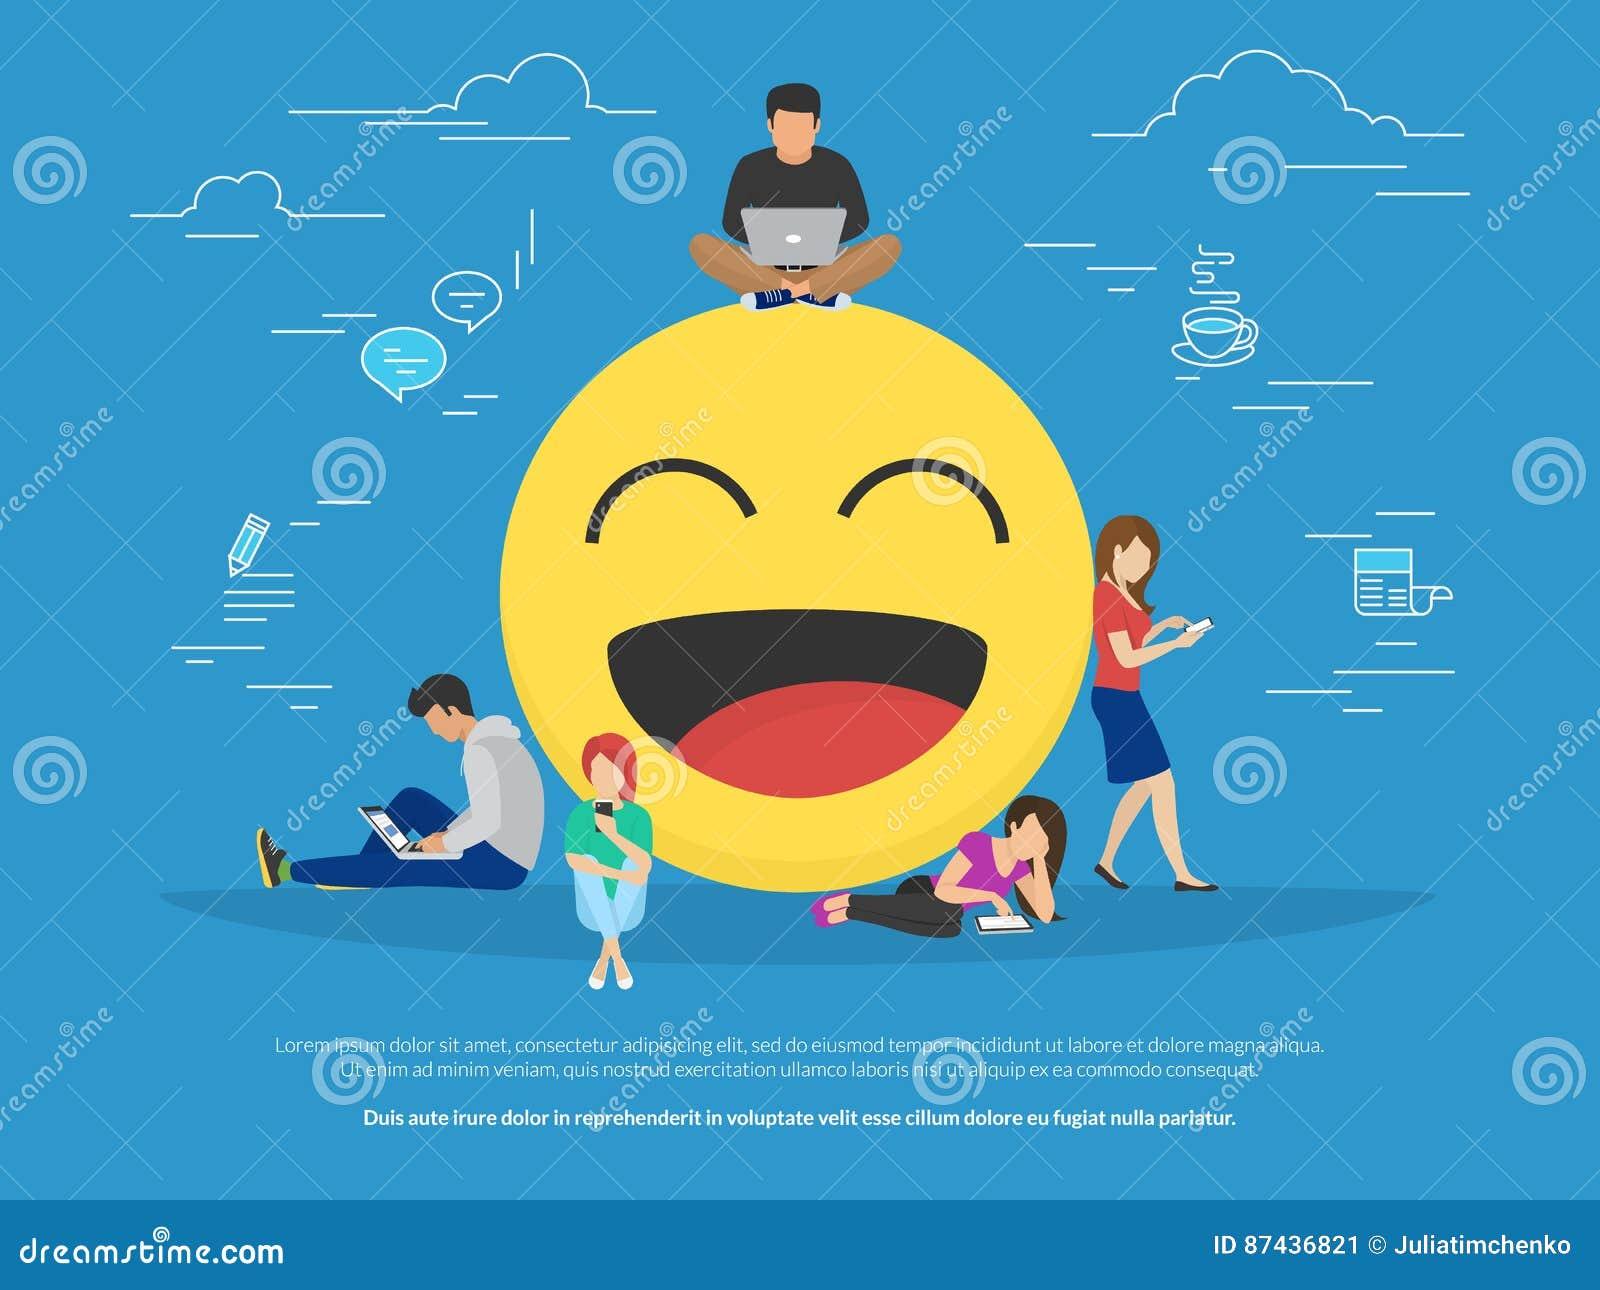 Emoji concept illustration stock vector illustration of internet emoji concept illustration buycottarizona Images